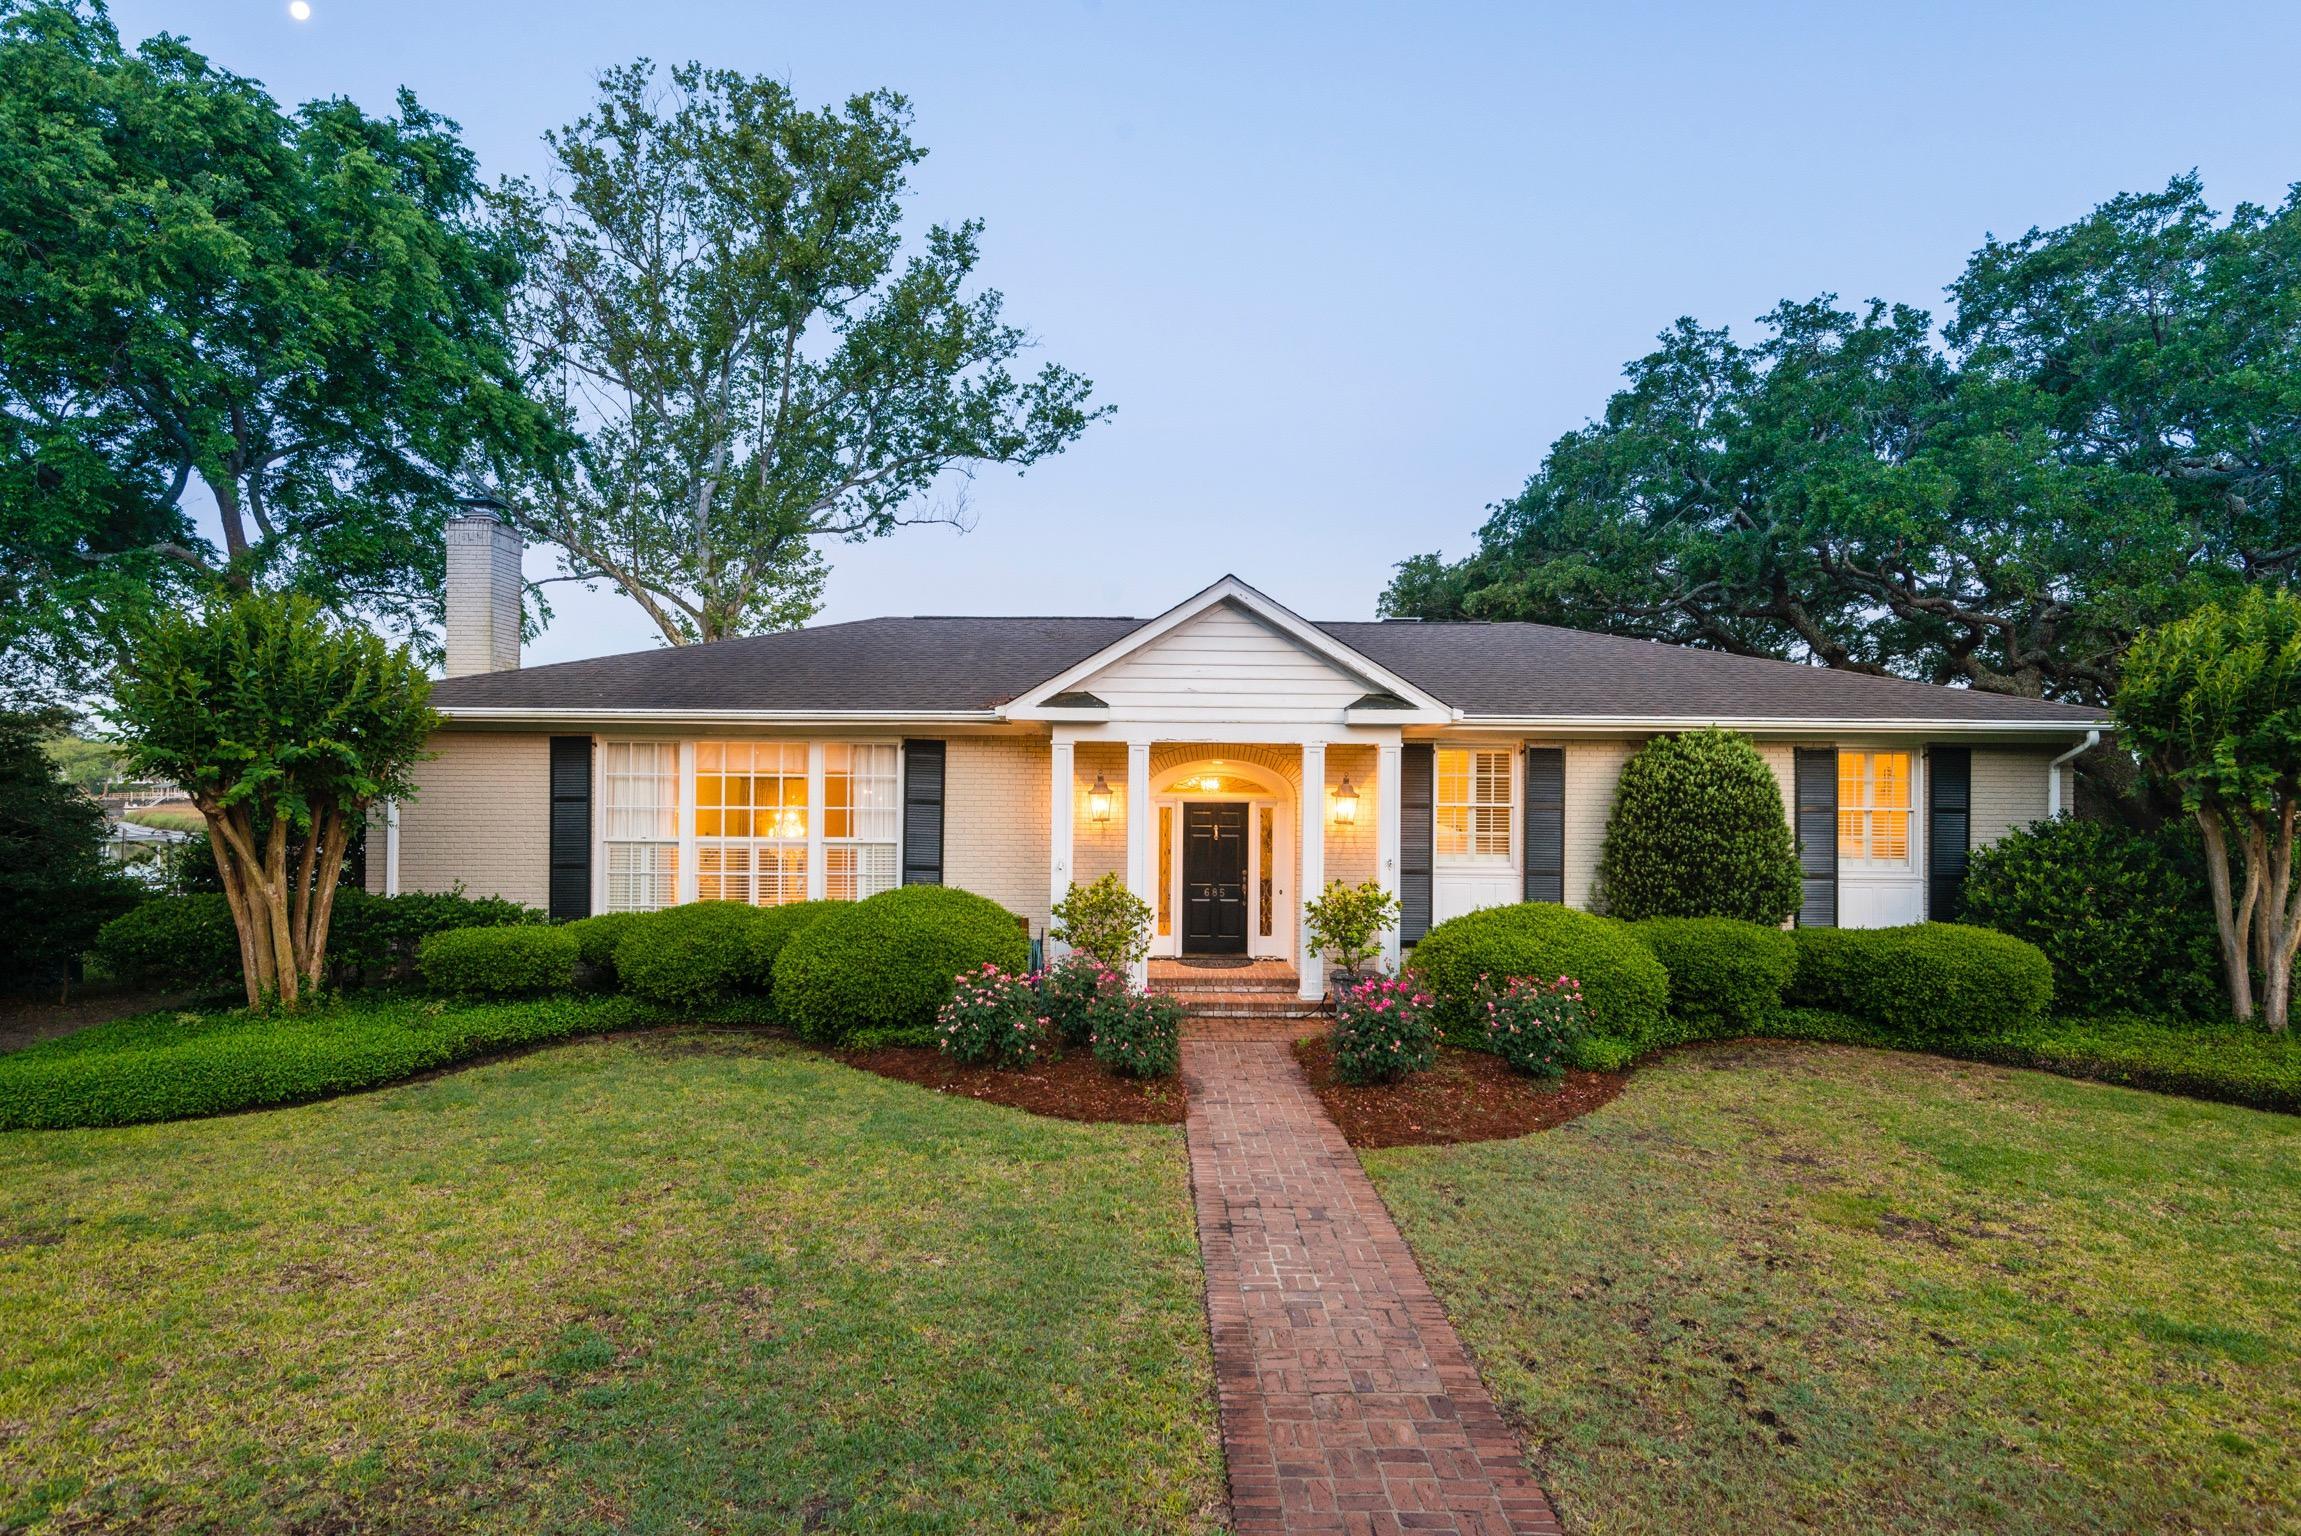 Lawton Bluff Homes For Sale - 685 Shore, Charleston, SC - 10